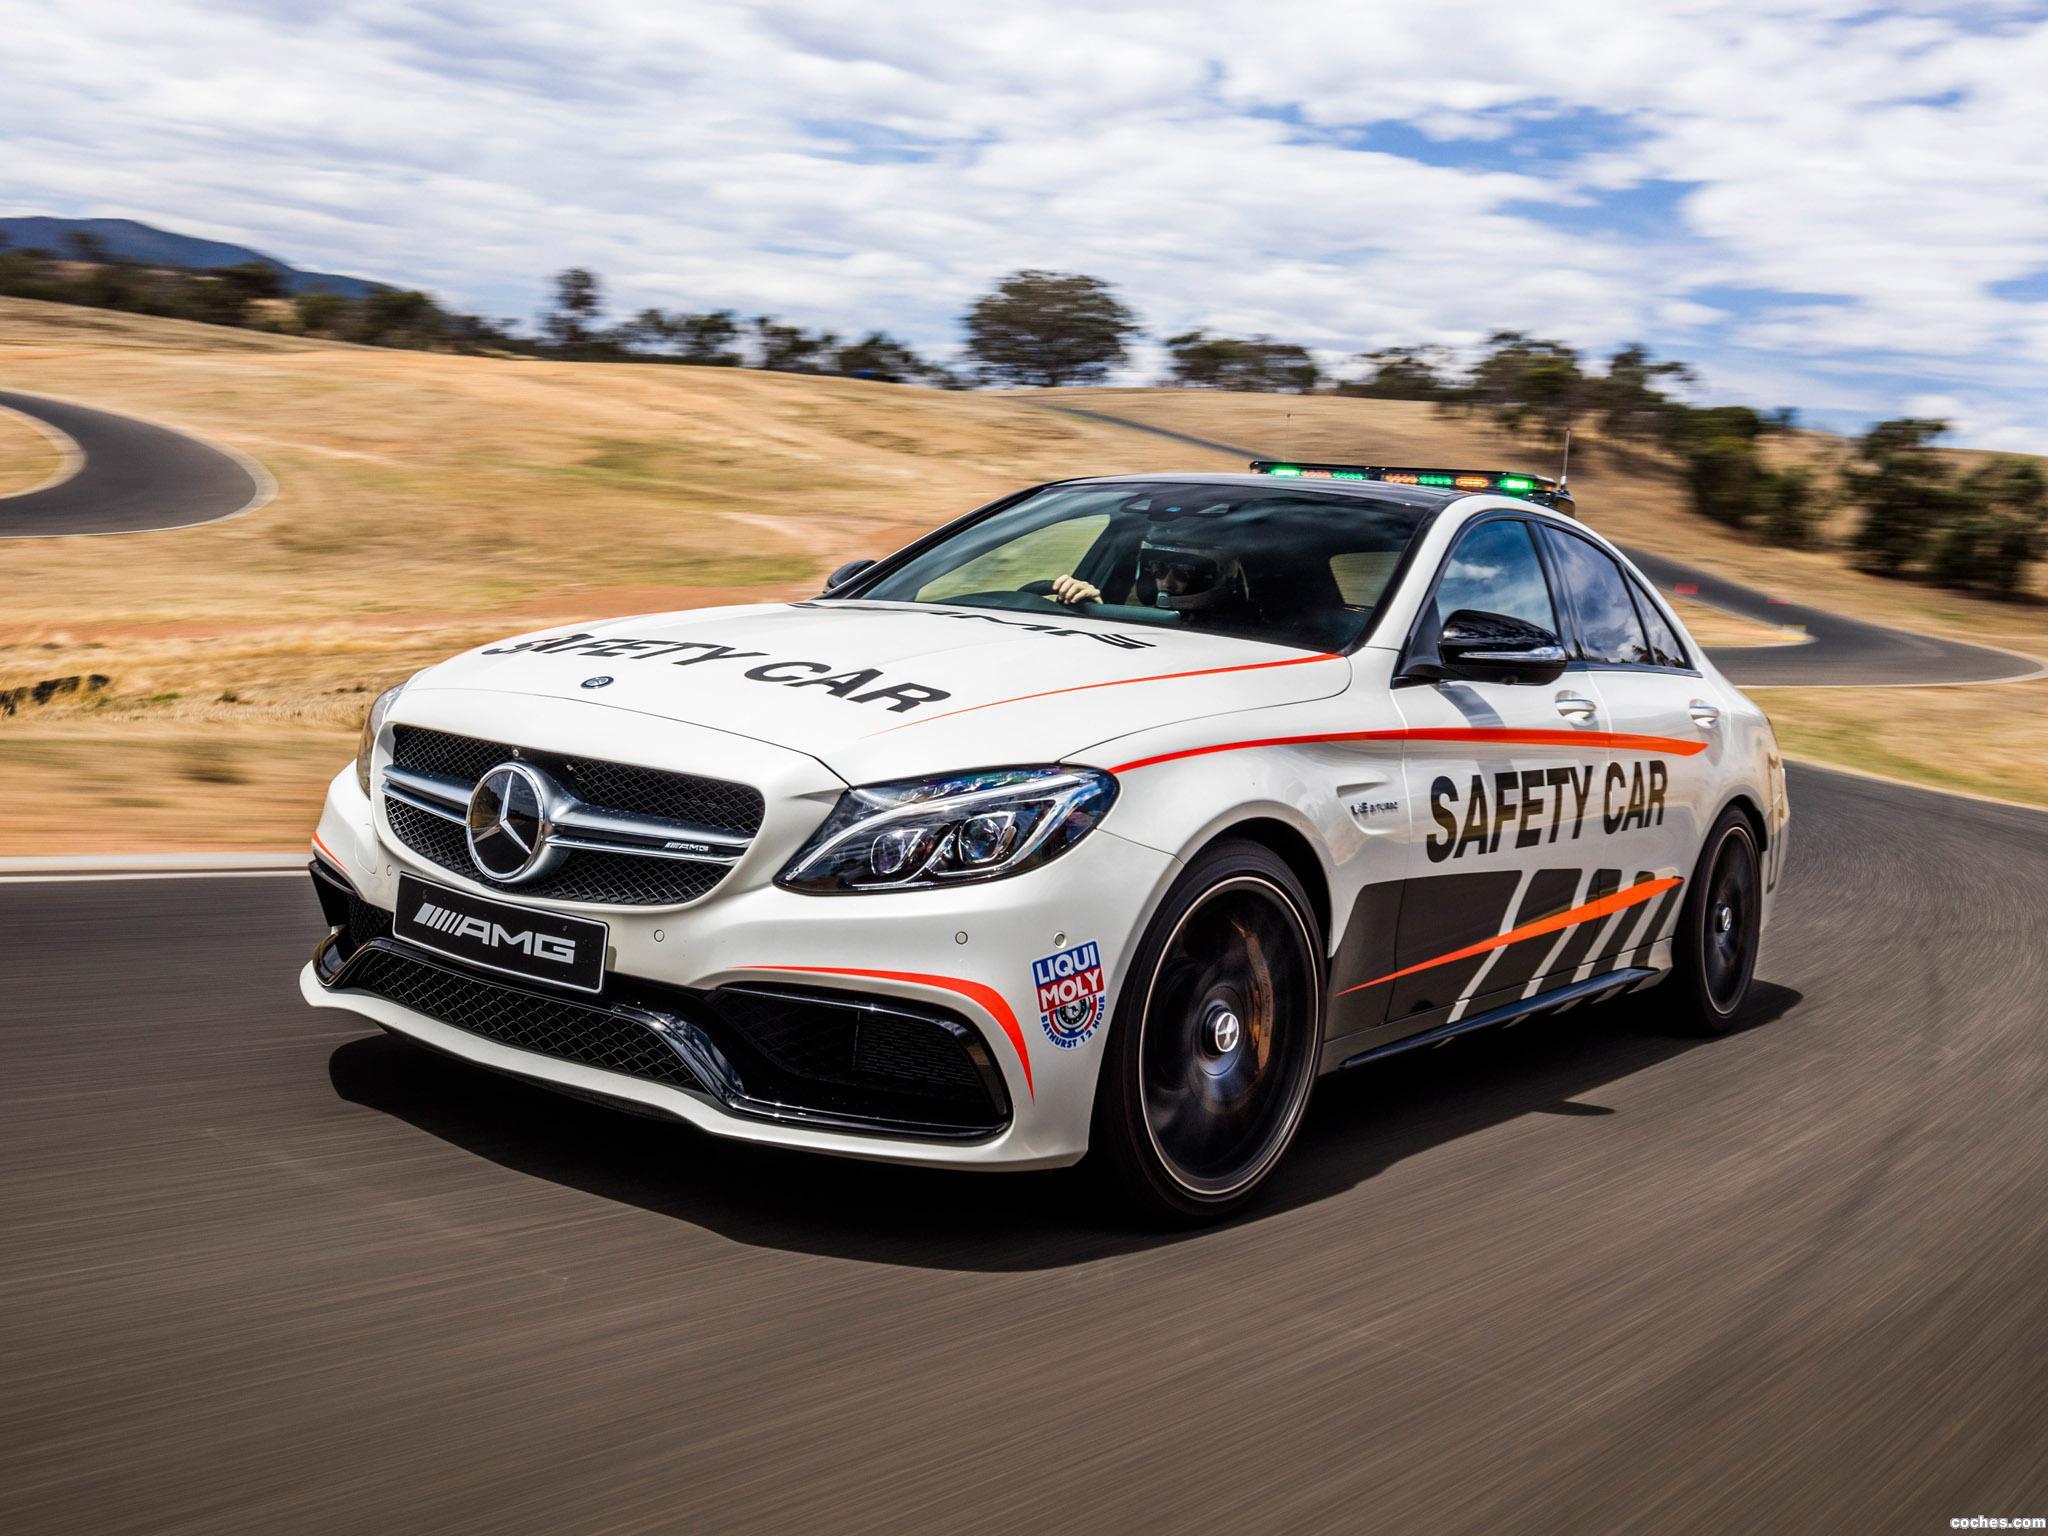 Foto 5 de Mercedes AMG C63 S Safety Car W205 2016